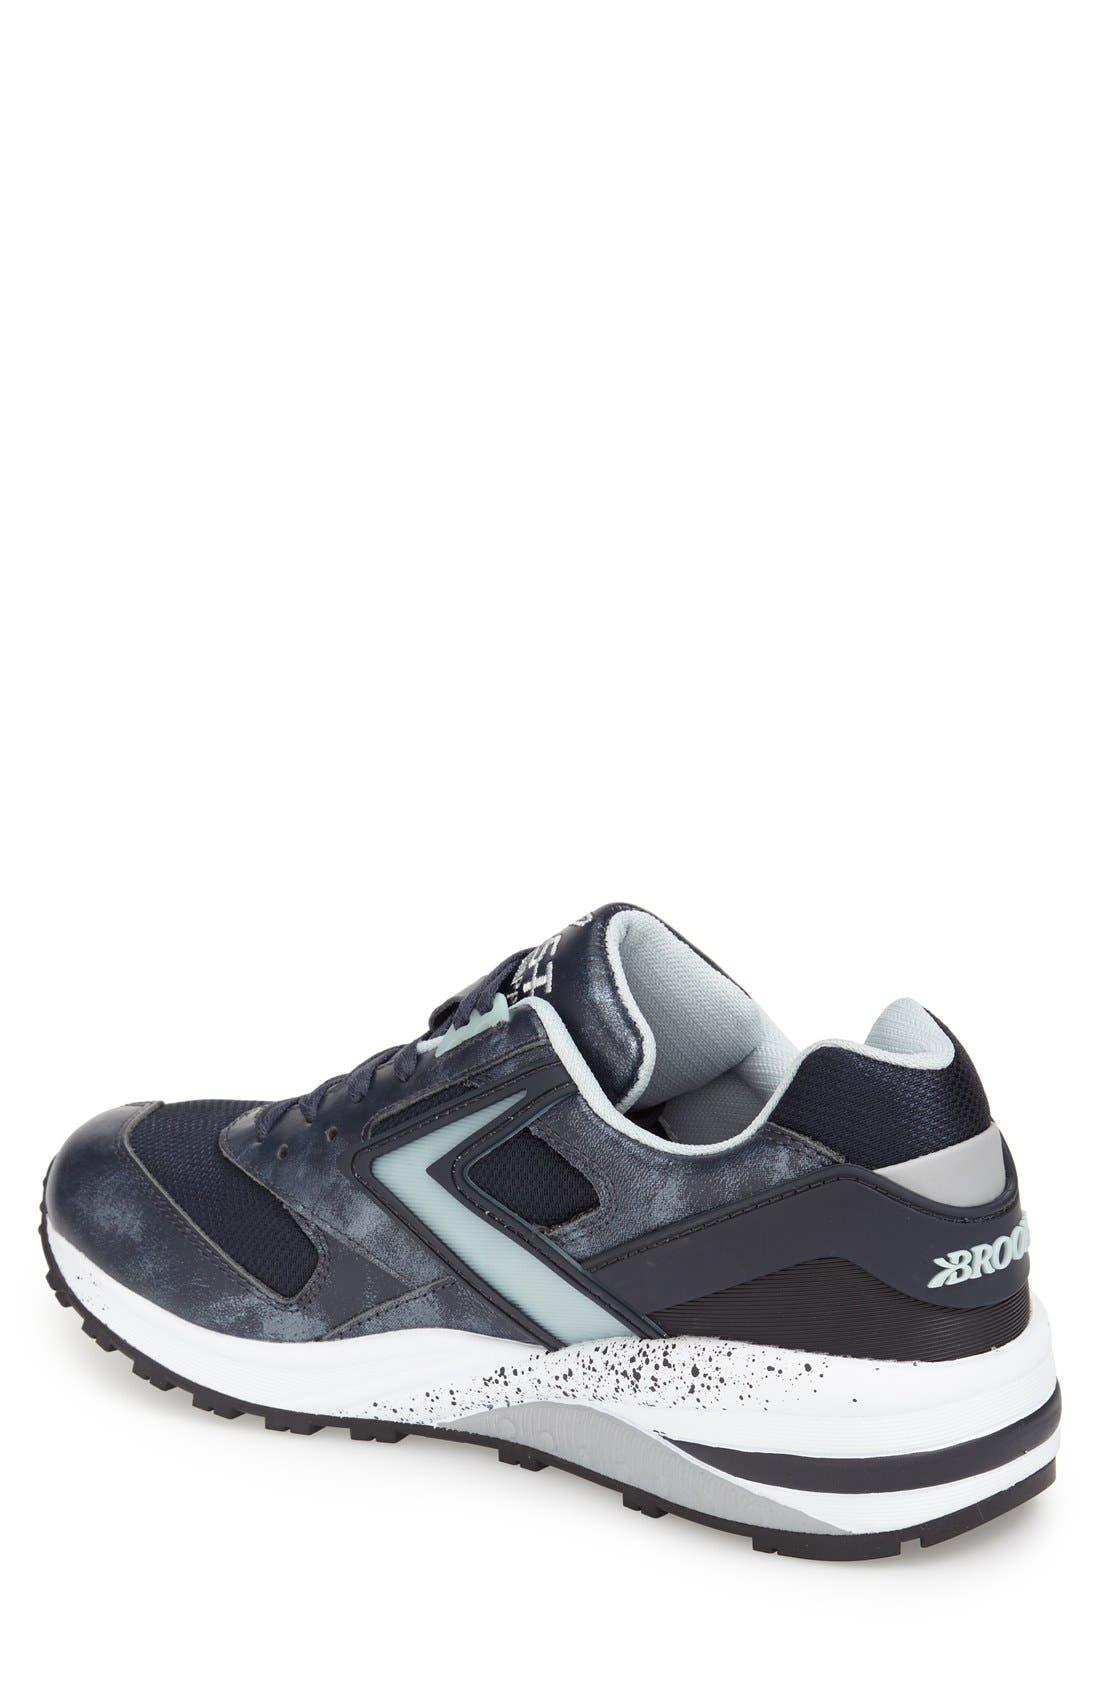 Alternate Image 2  - Brooks 'Futuristic Beast' Sneaker (Men)